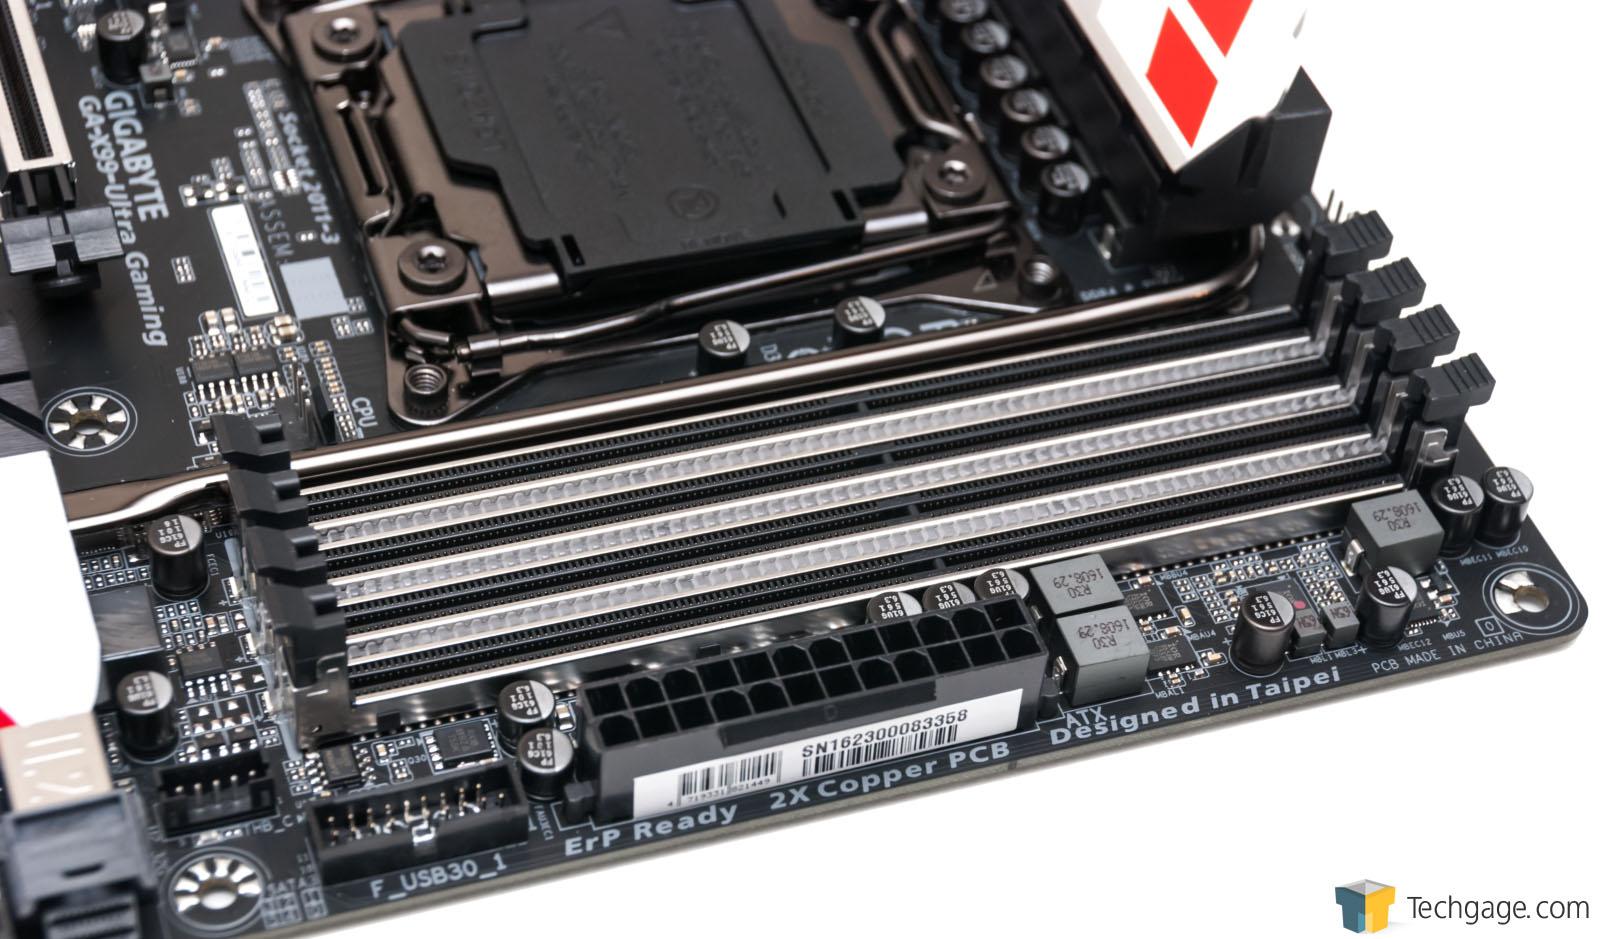 Gigabyte X99 Ultra Gaming Motherboard Review Techgage Mainboard Ga Z270 Phoenix Socket 1151 Kaby Lake Intel